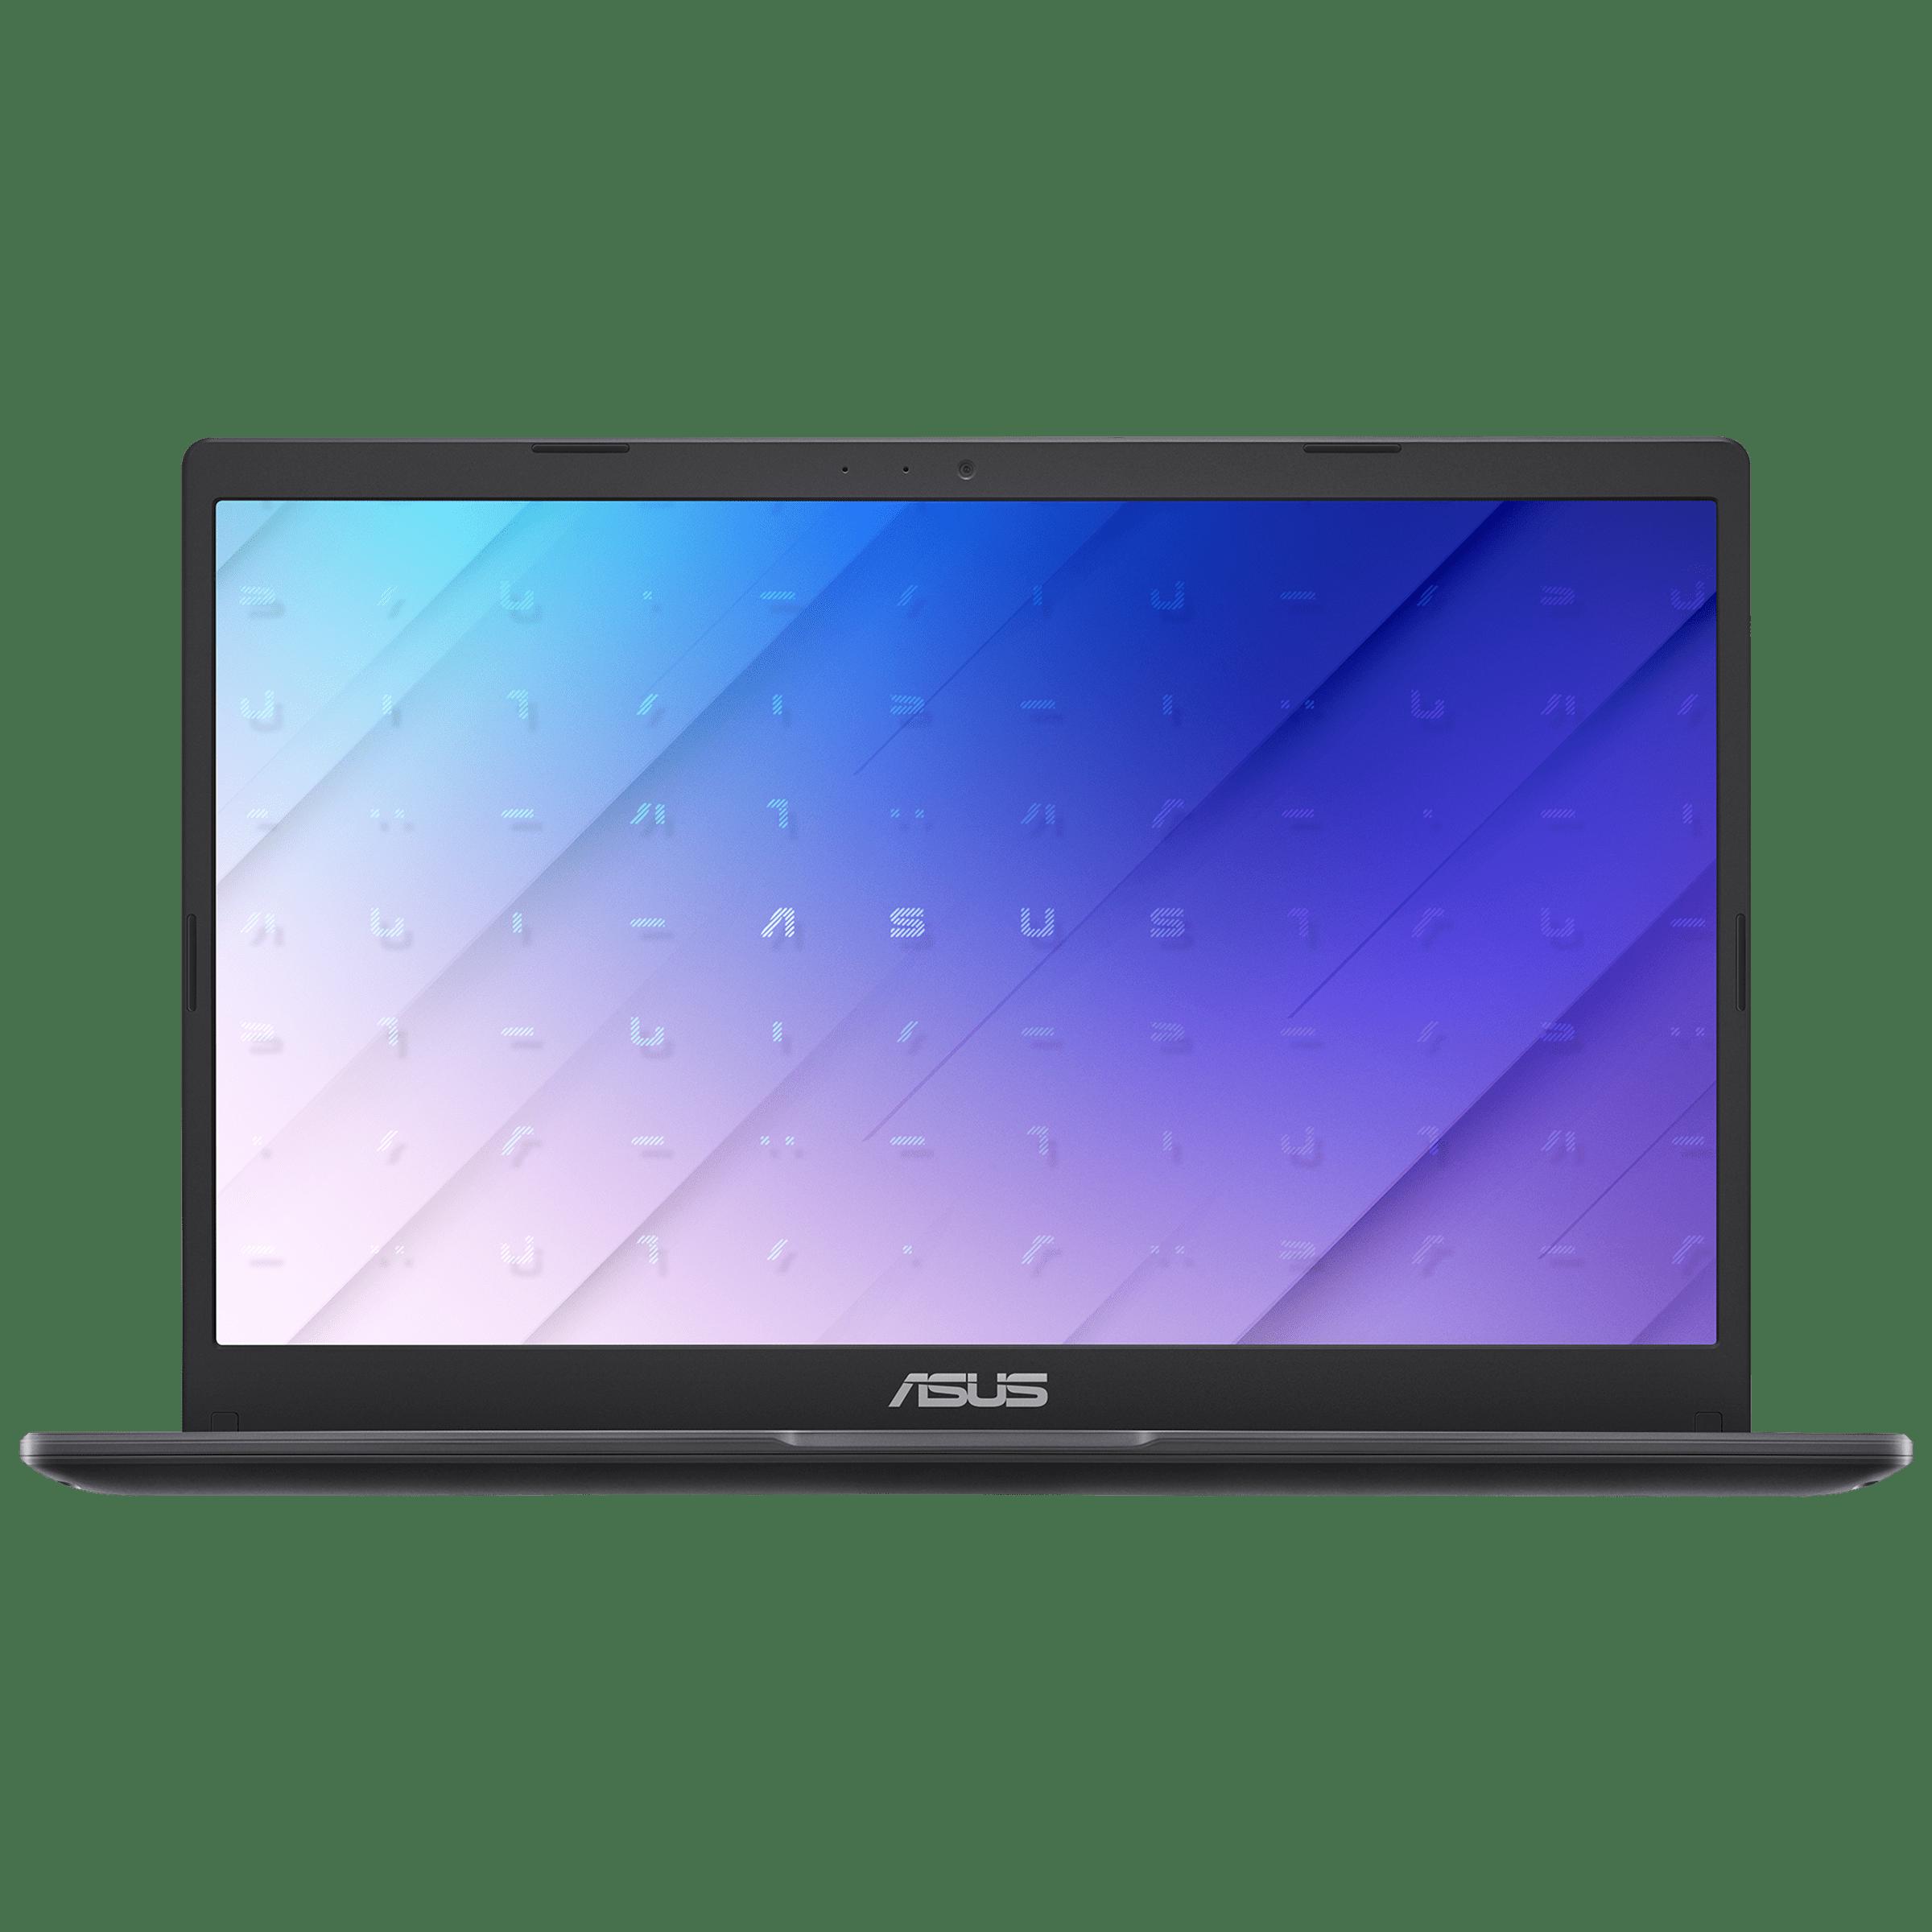 Asus E410MA-EK001T (90NB0Q11-M04220) Celeron Windows 10 Home Laptop (4GB RAM, 256GB SSD, UHD Graphics 600, 35.56cm, Peacock Blue)